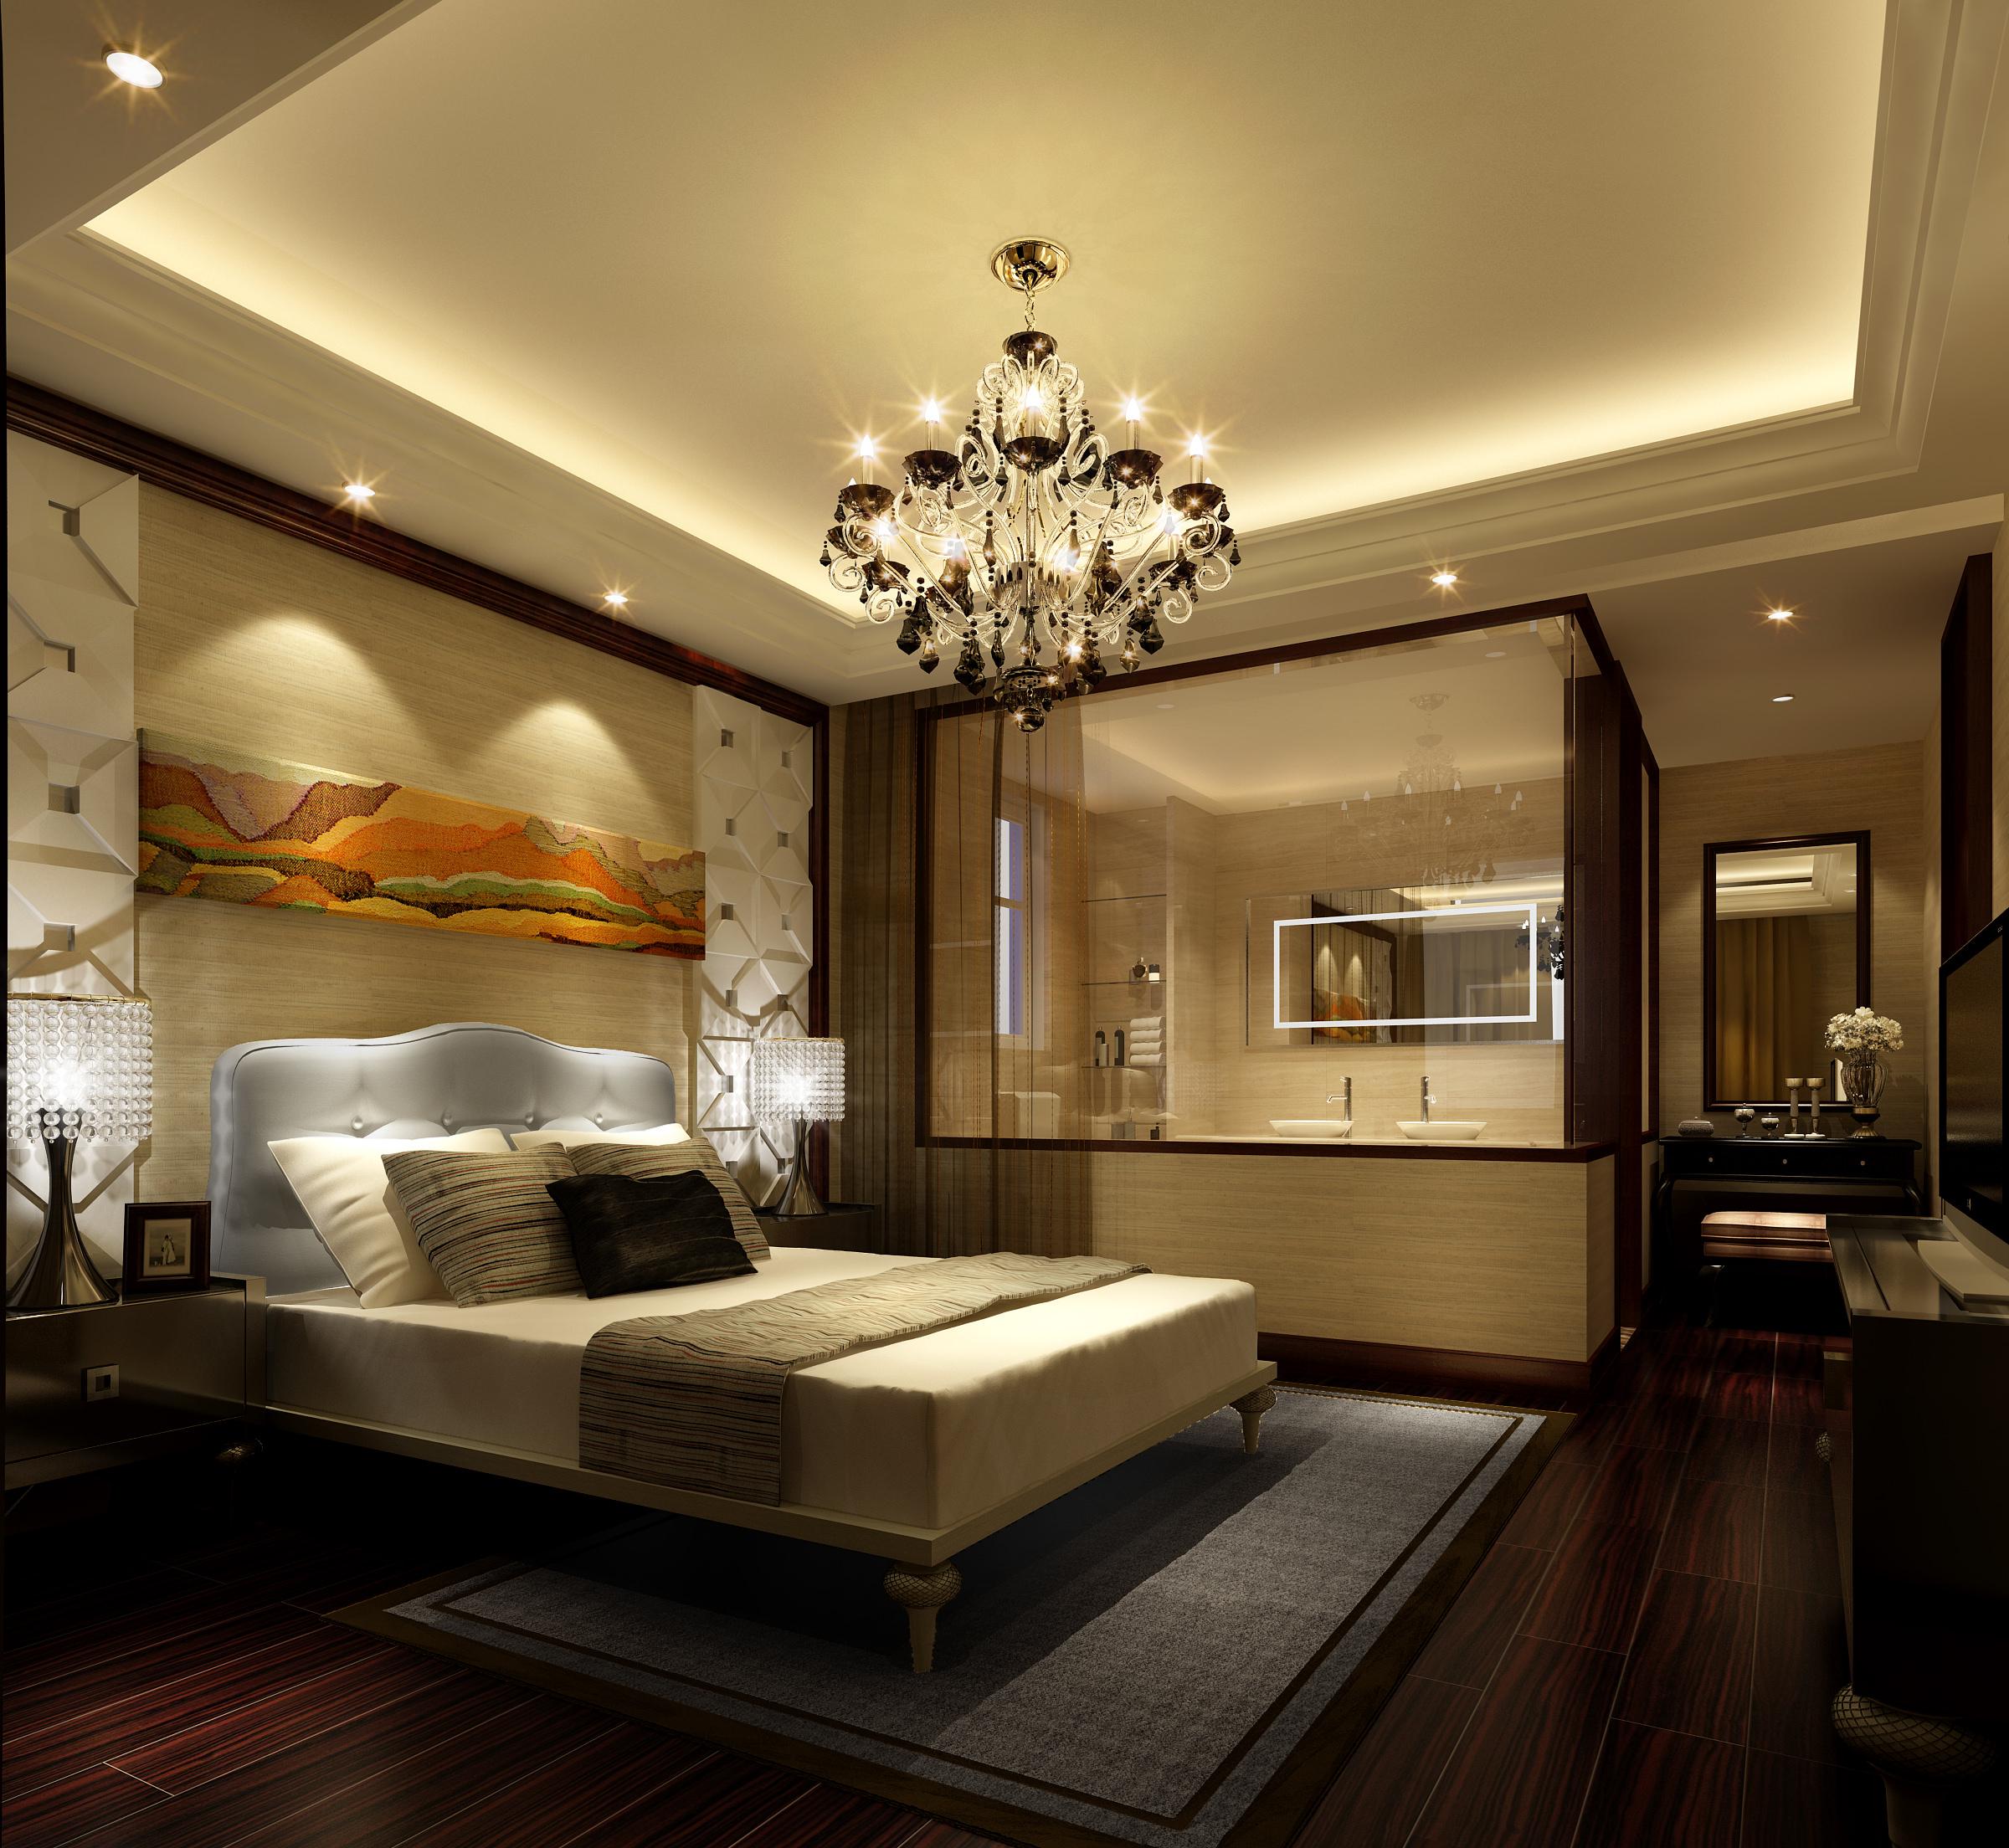 Bedroom with bathroom 3D Model MAX | CGTrader.com on Bathroom Model Design  id=53505